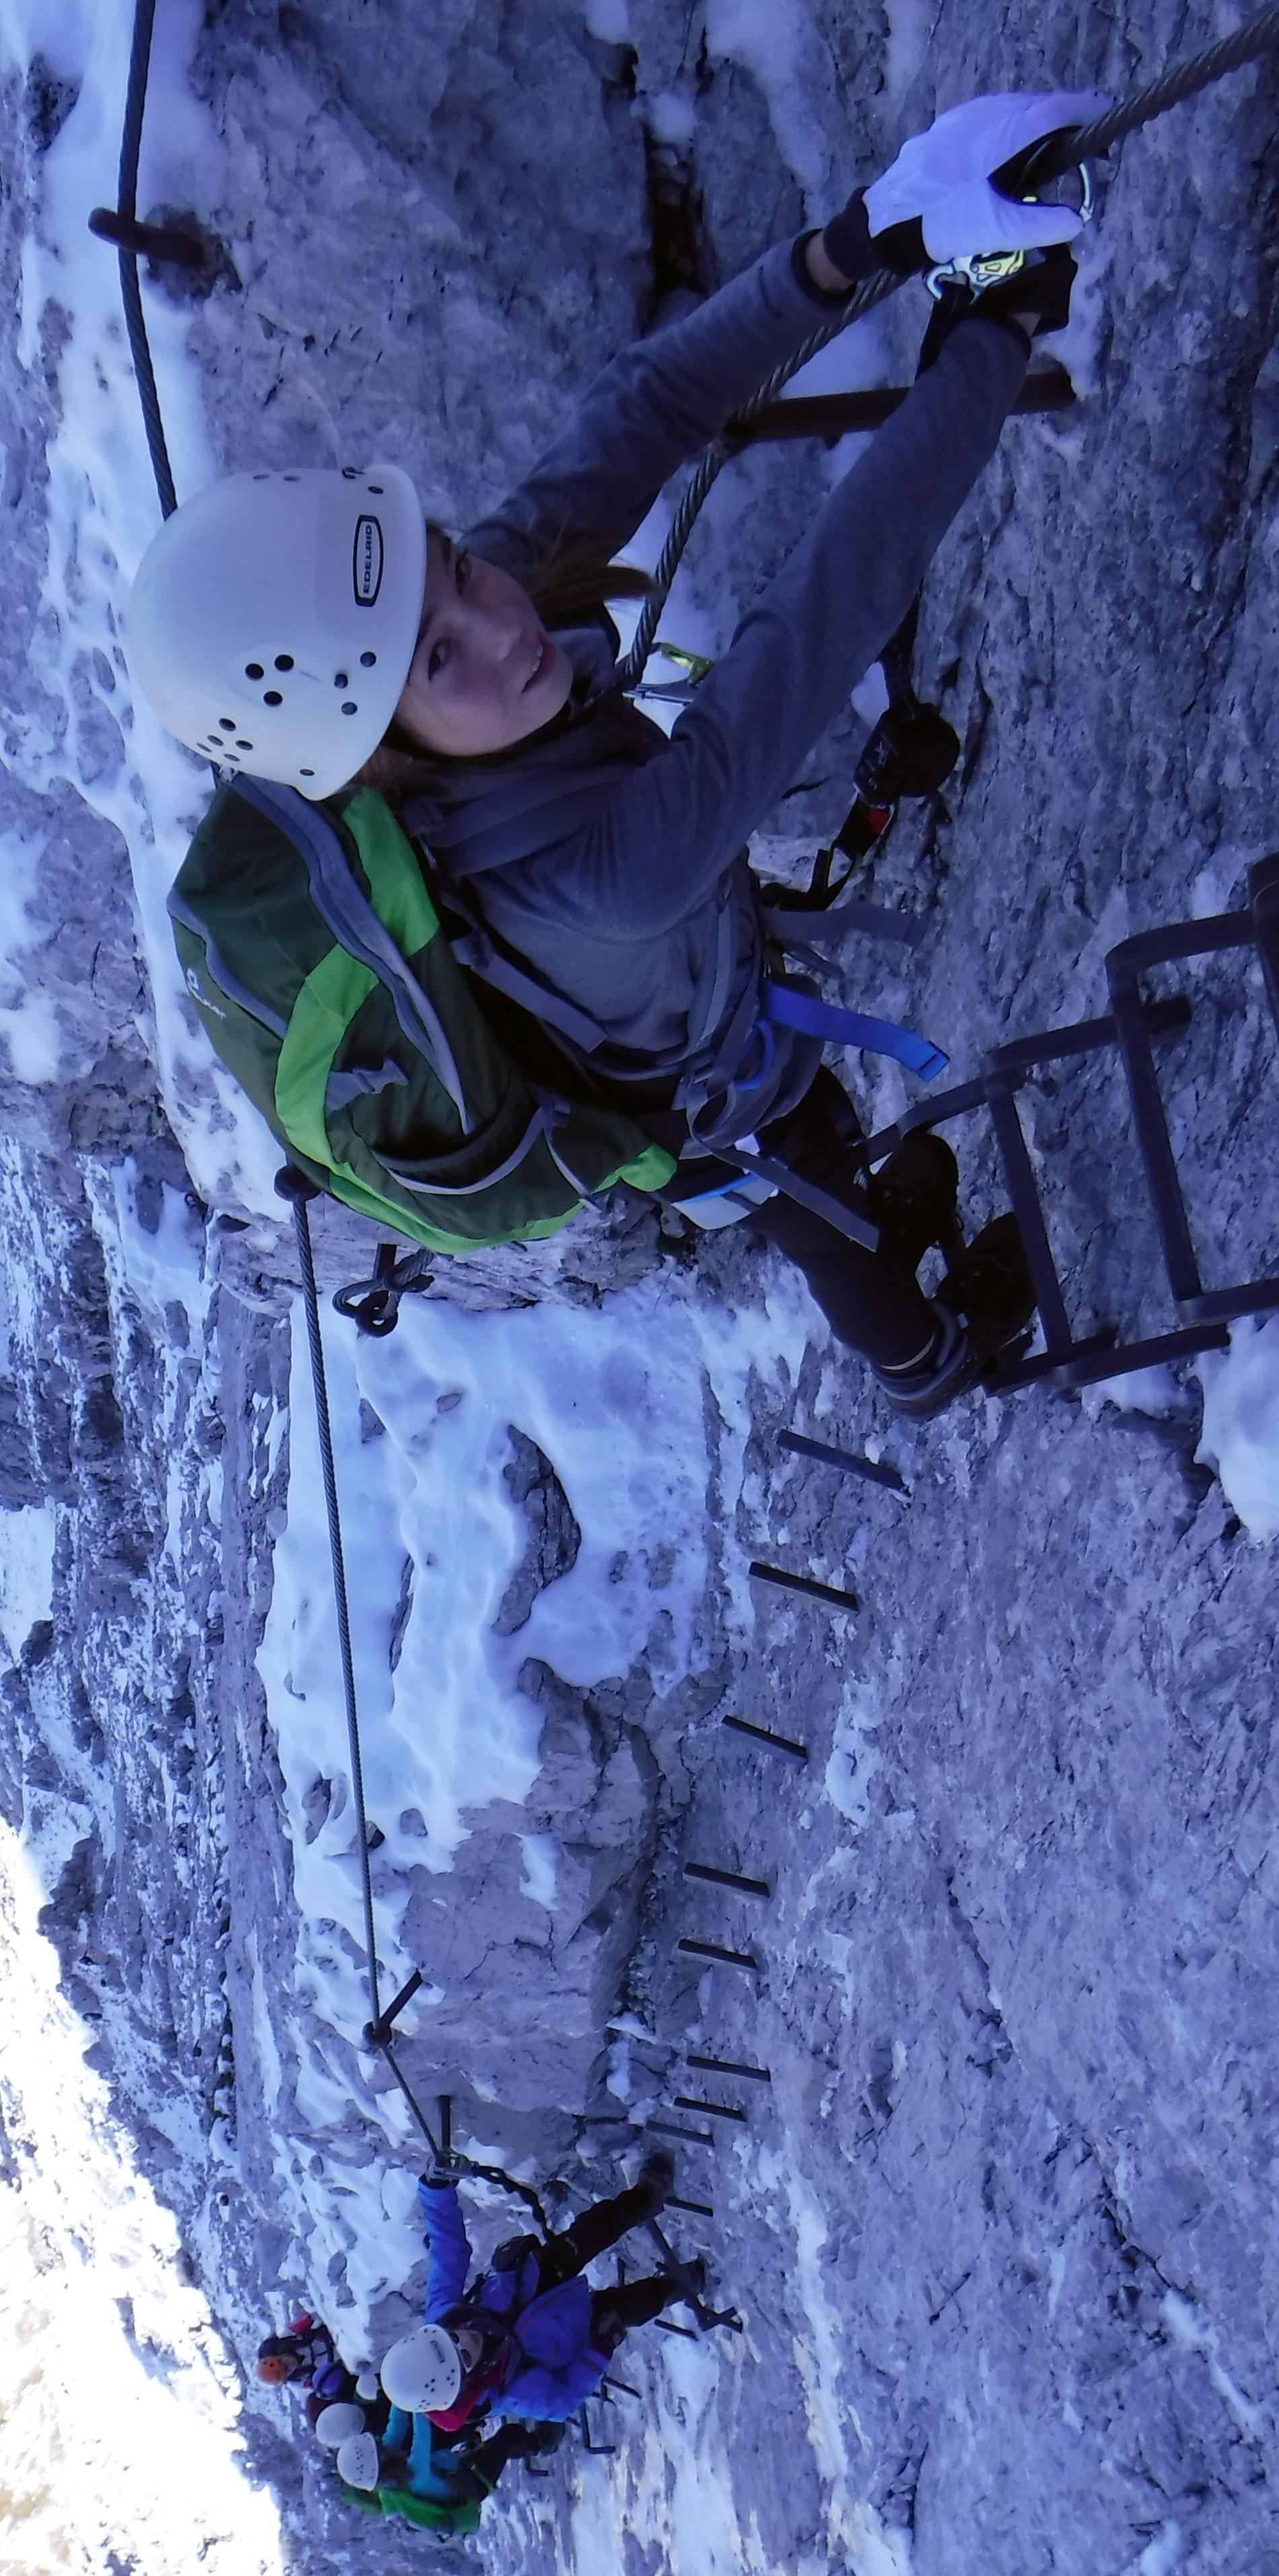 Alpspitze_02.JPG